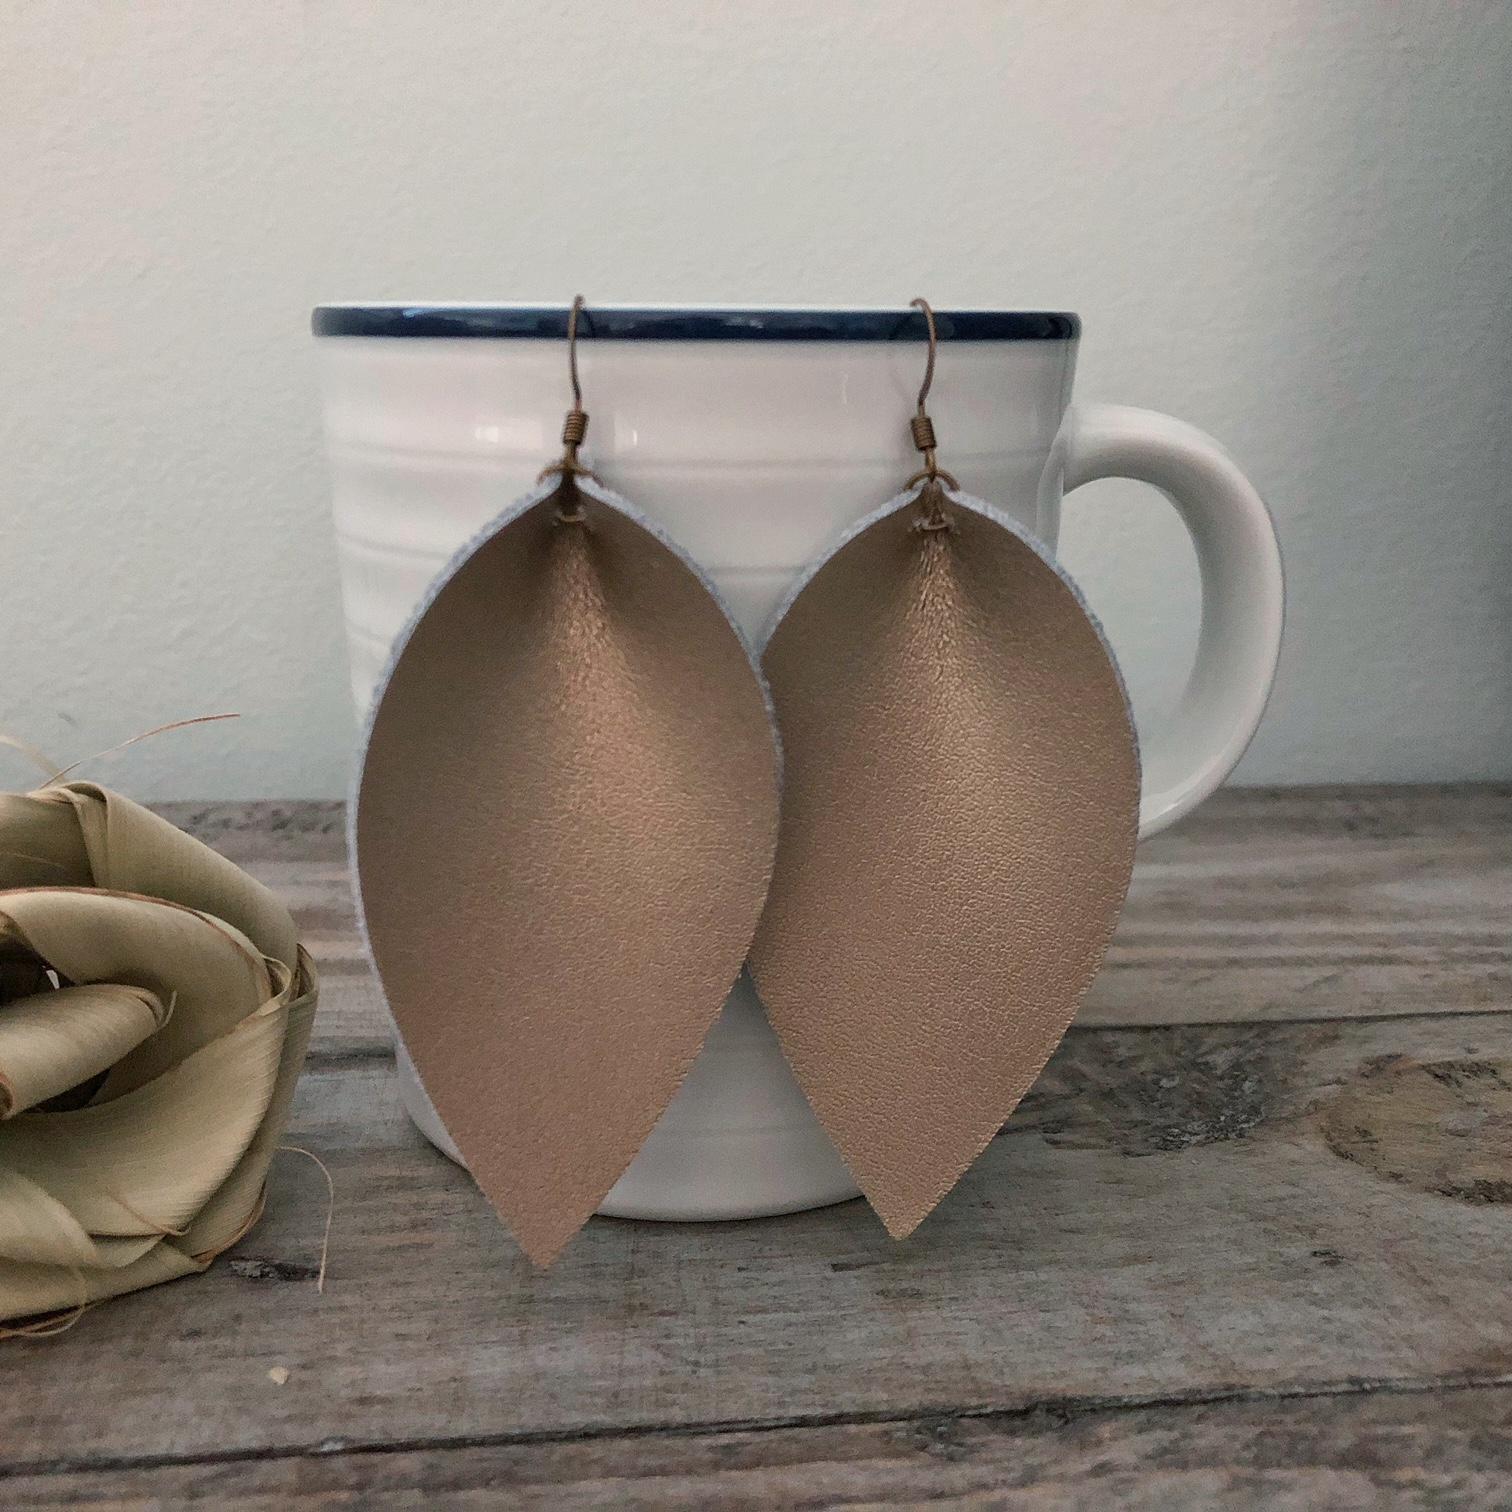 Handmade Leather \u201cJoanna Gaines\u201d style Earrings